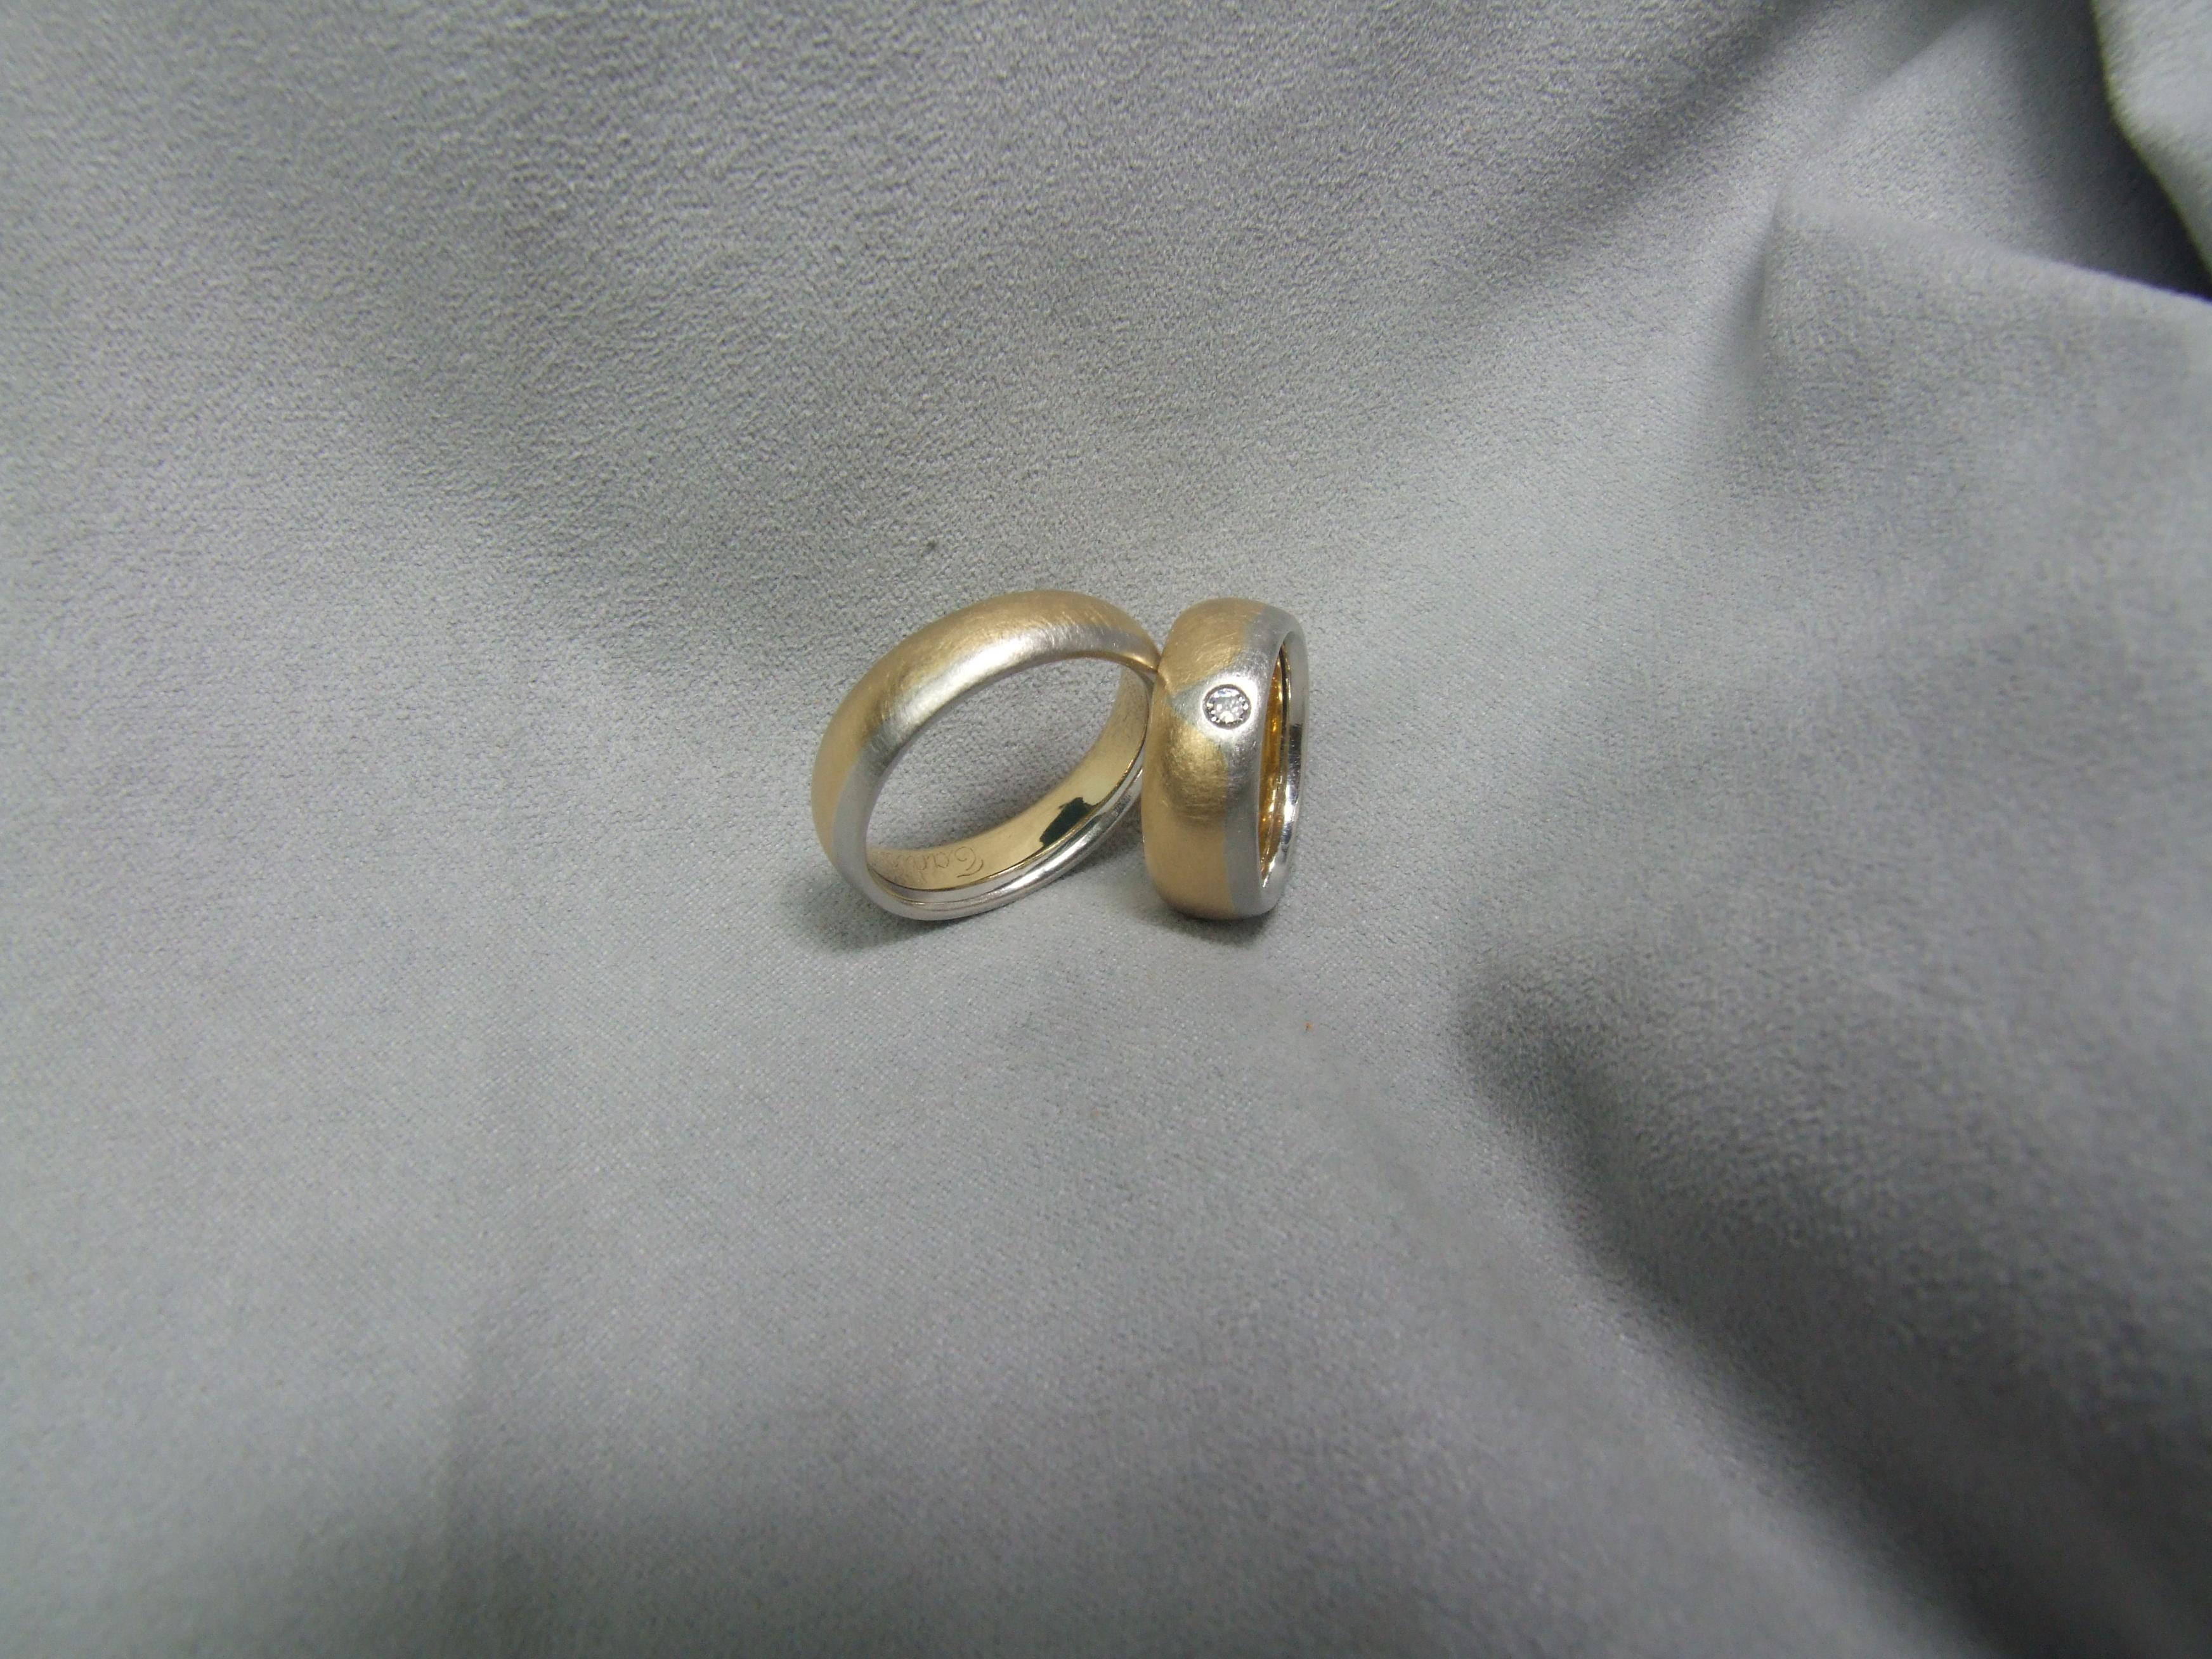 2008_0121Datensicherung0106